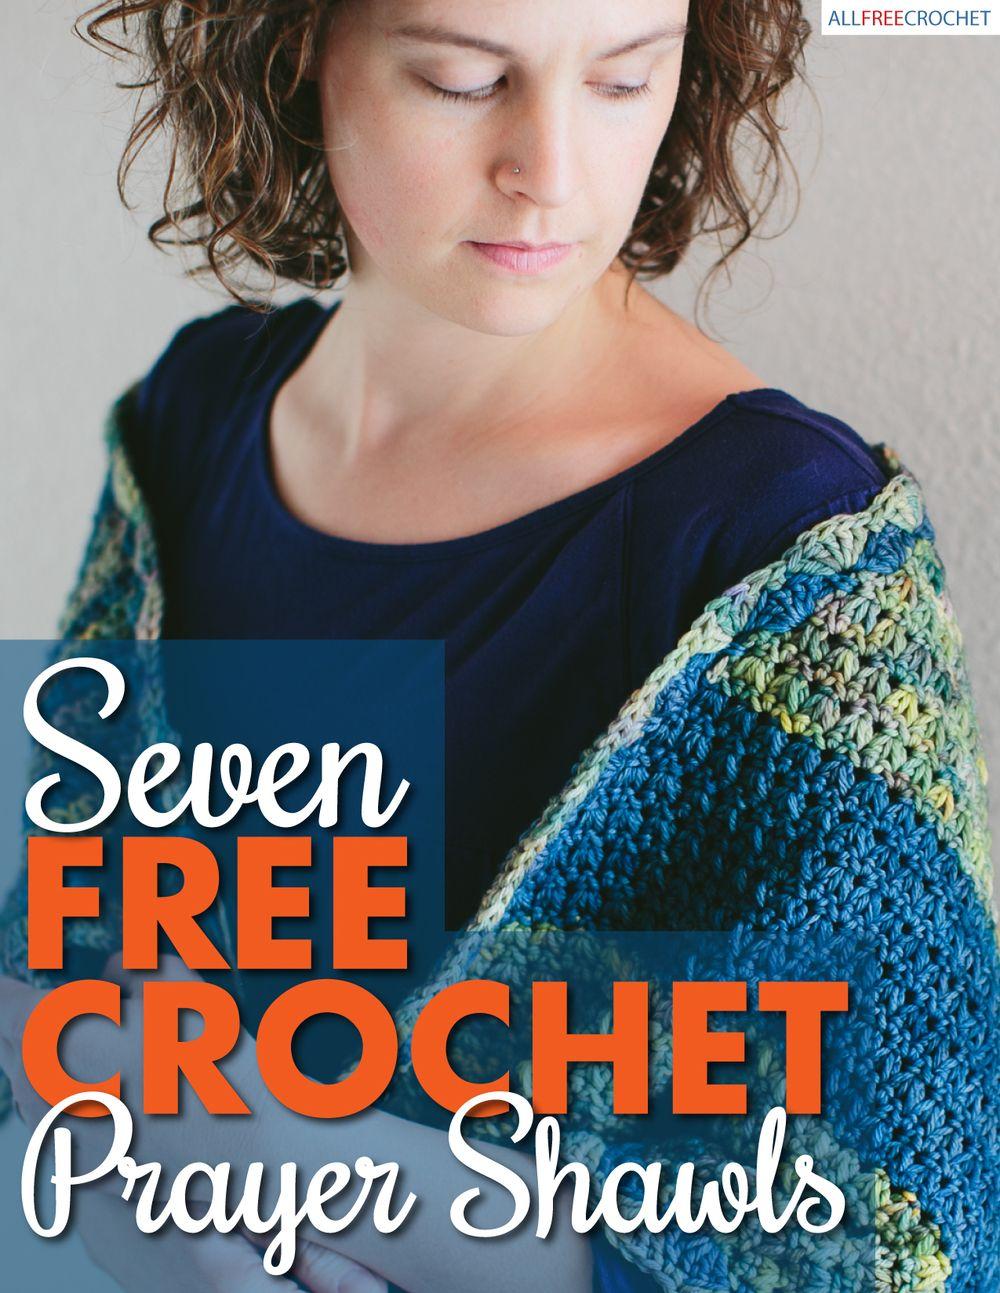 7 Free Crochet Prayer Shawls | Crochet prayer shawls, Prayer shawl ...